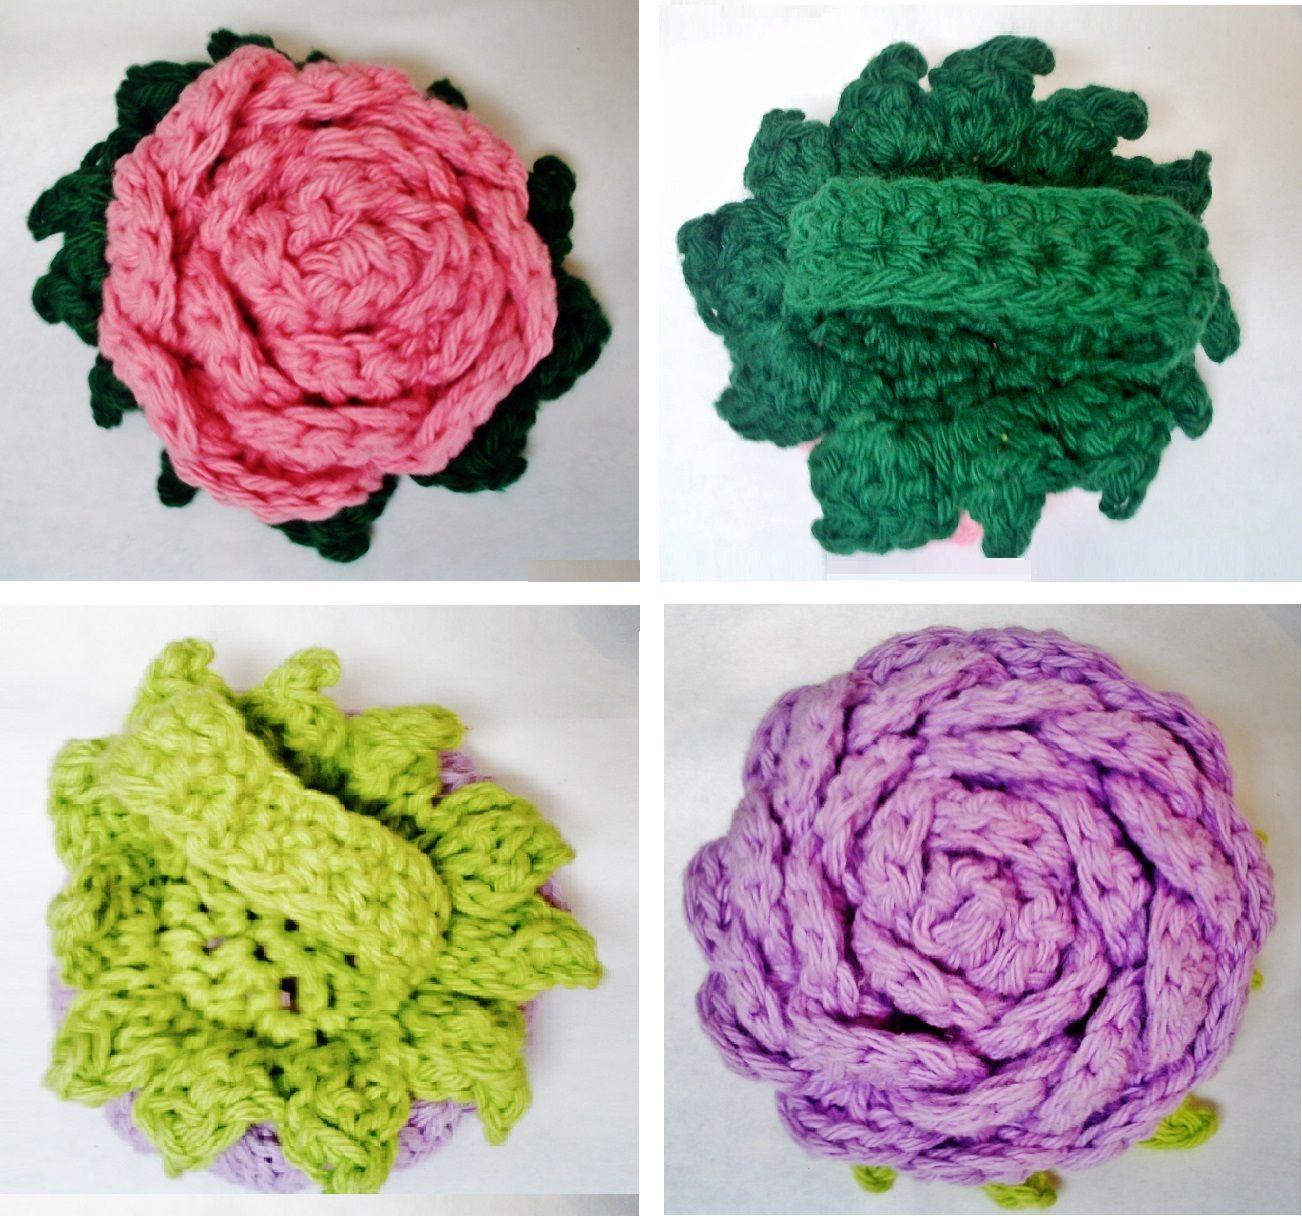 Rose / Rose Scrubby Crochet Patterns